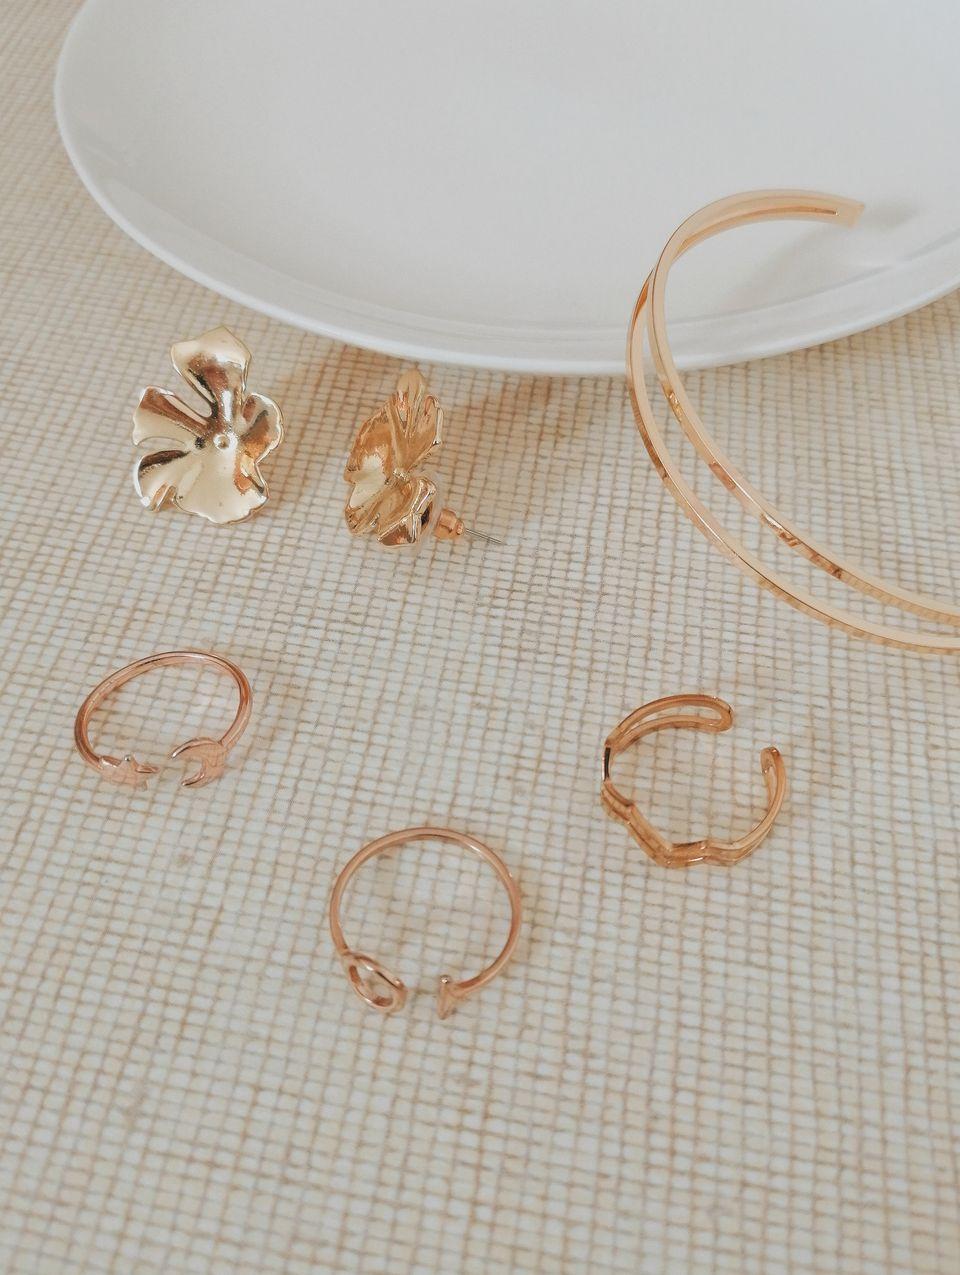 Gold jewelry and jewelry dish